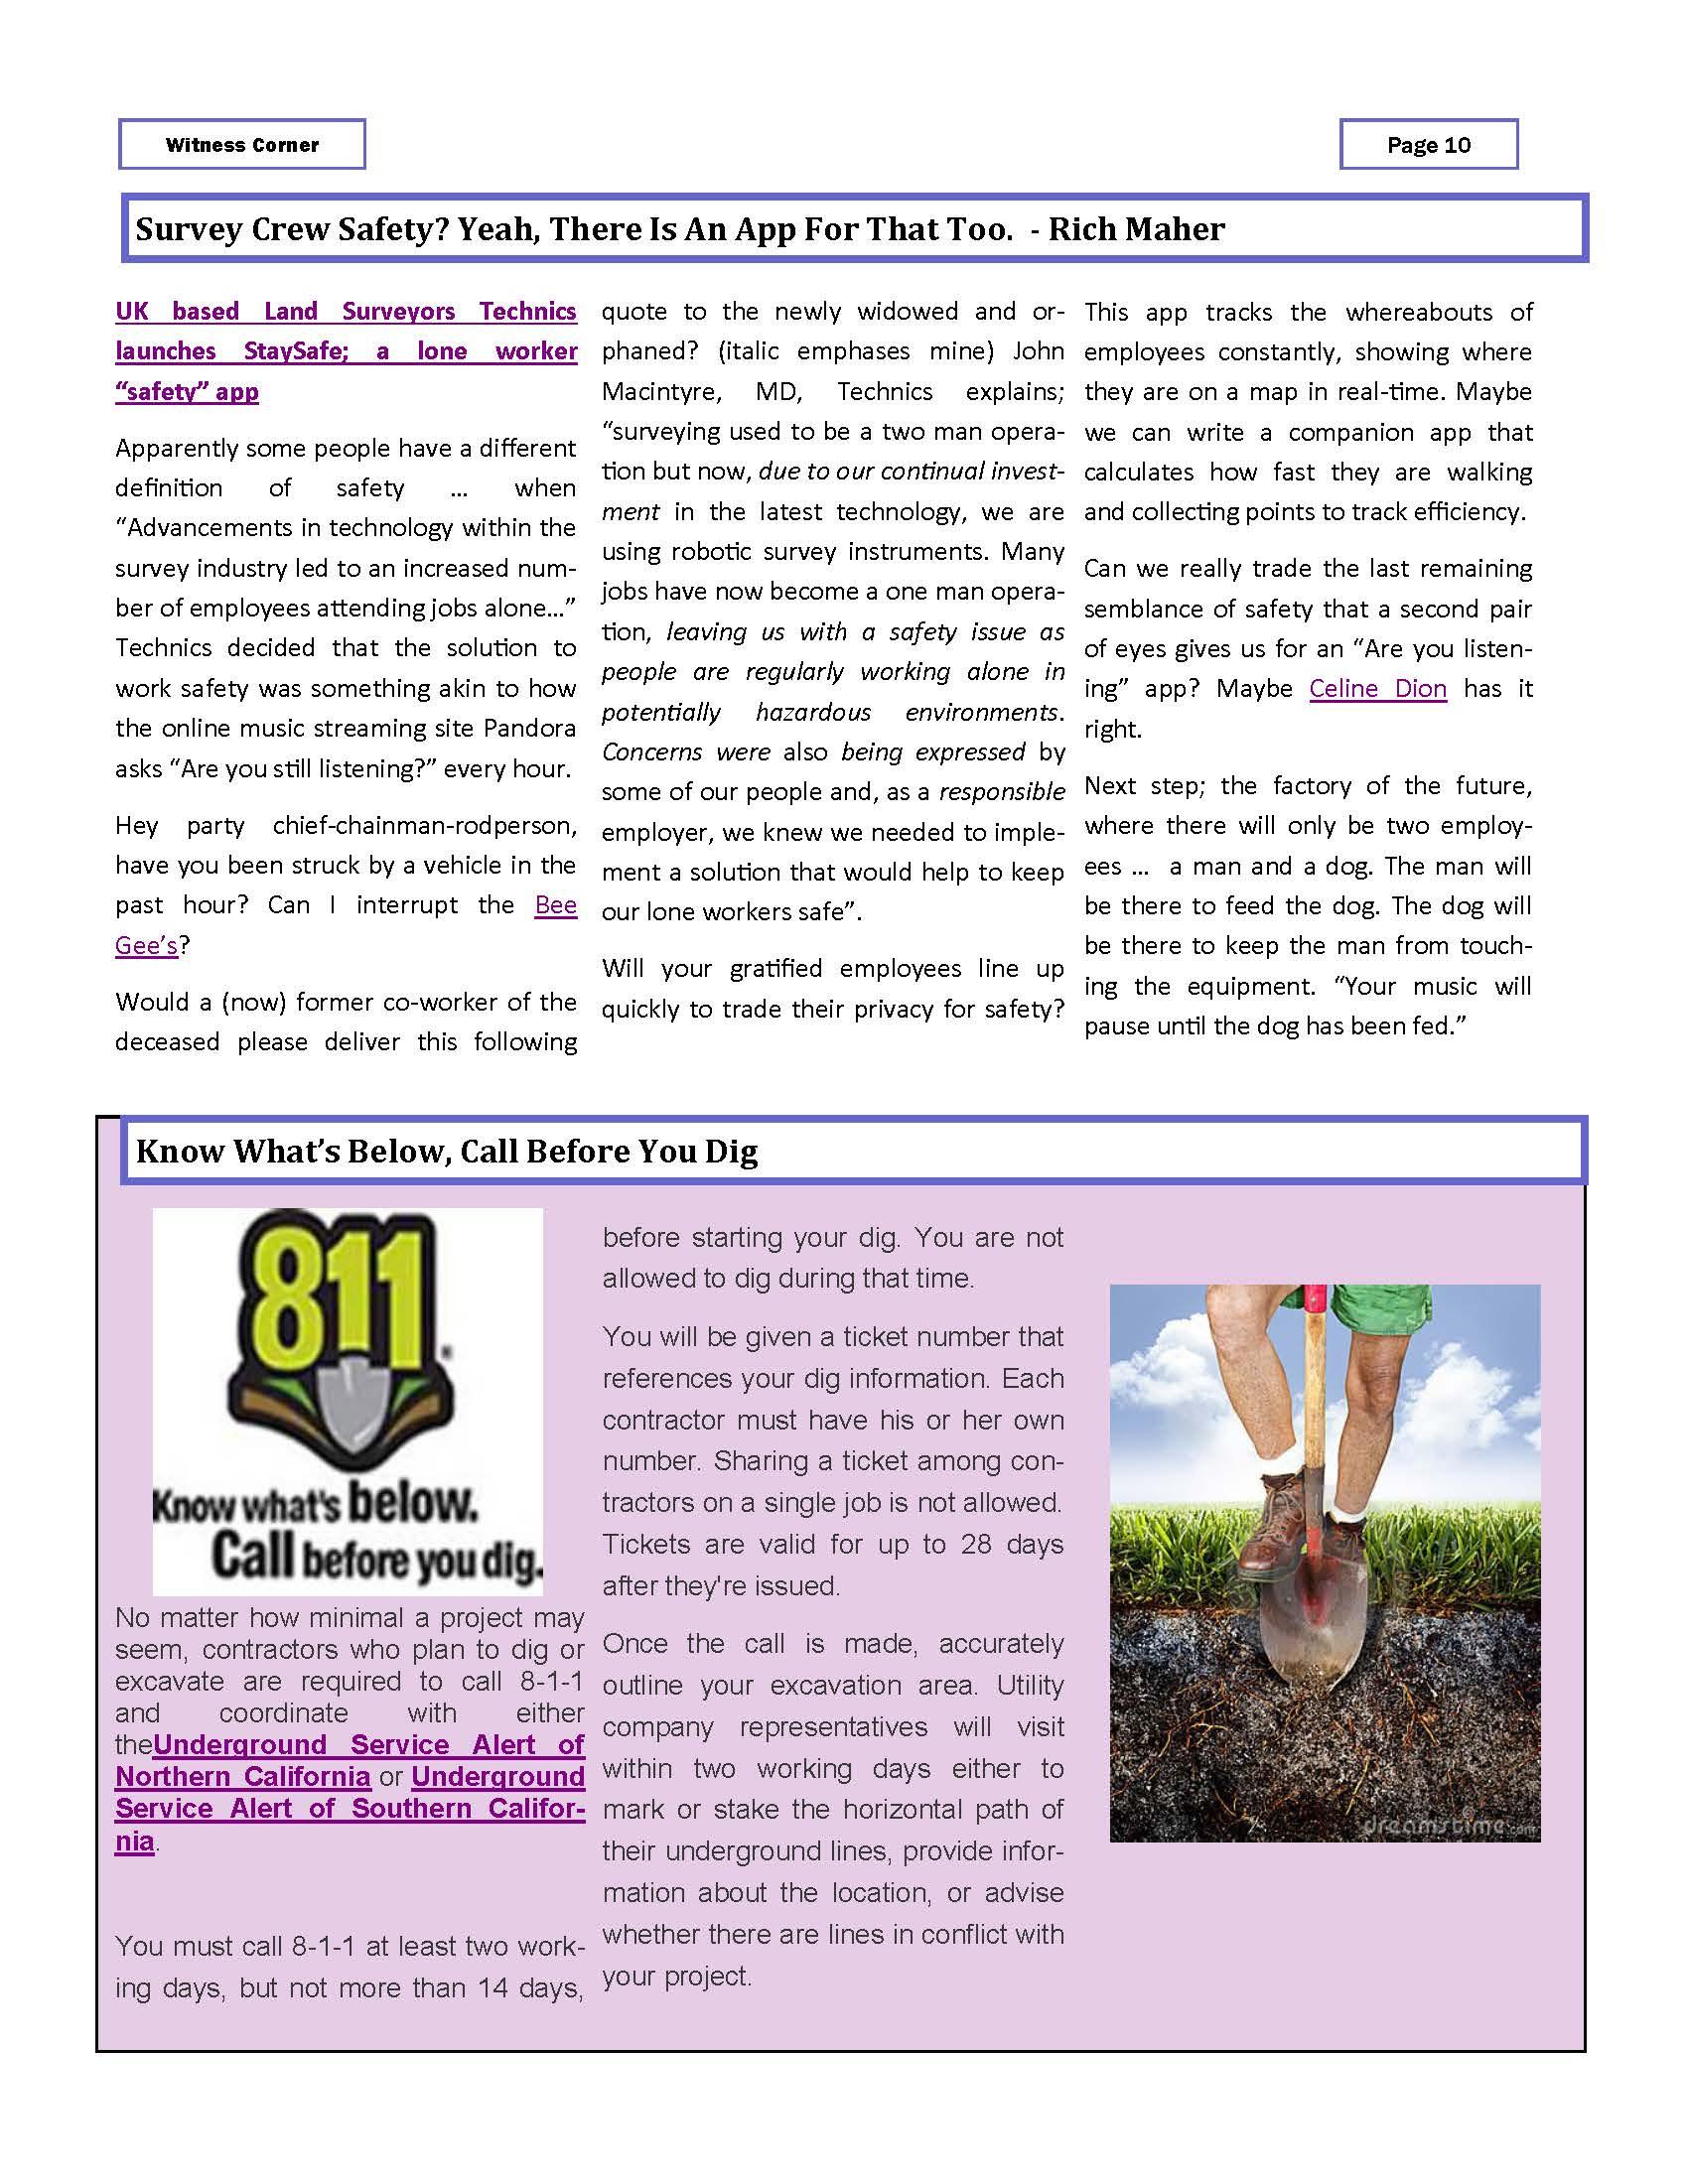 OC-CLSA 082015 Newsletter_Page_12.jpg